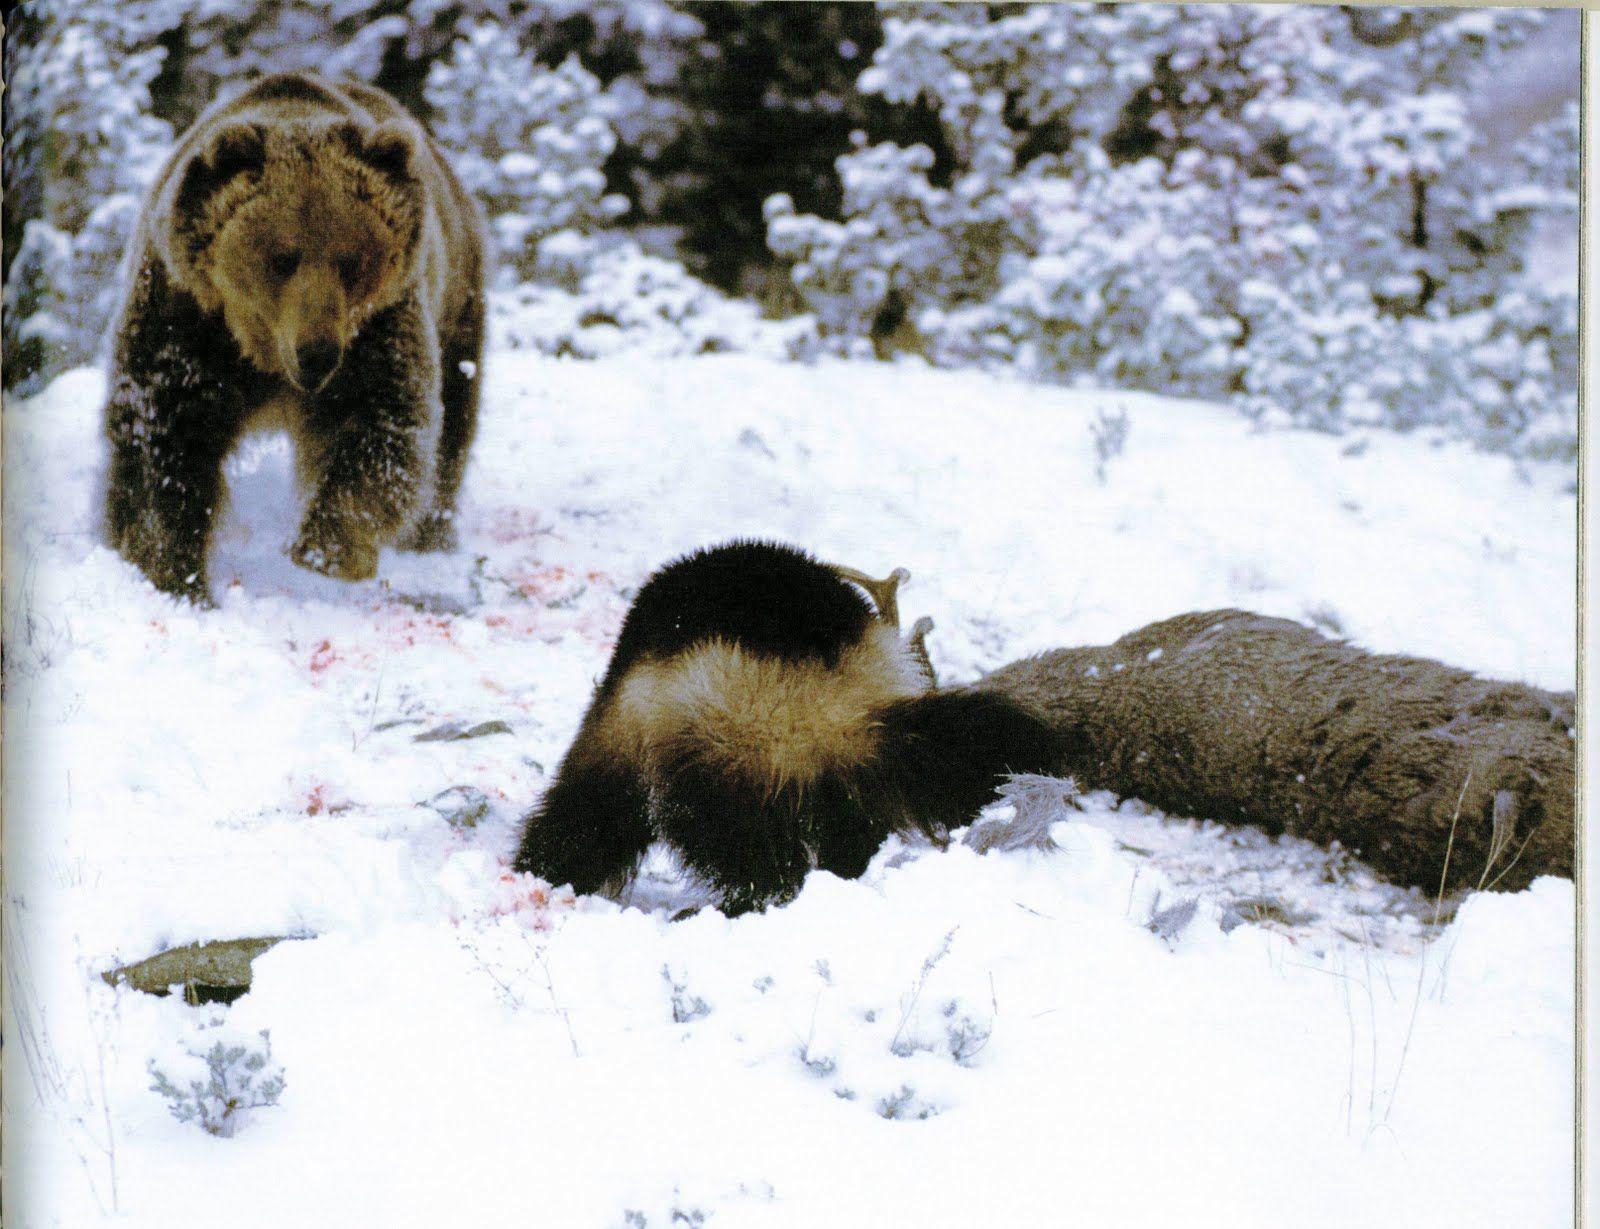 15++ Wolverine animal size comparison images